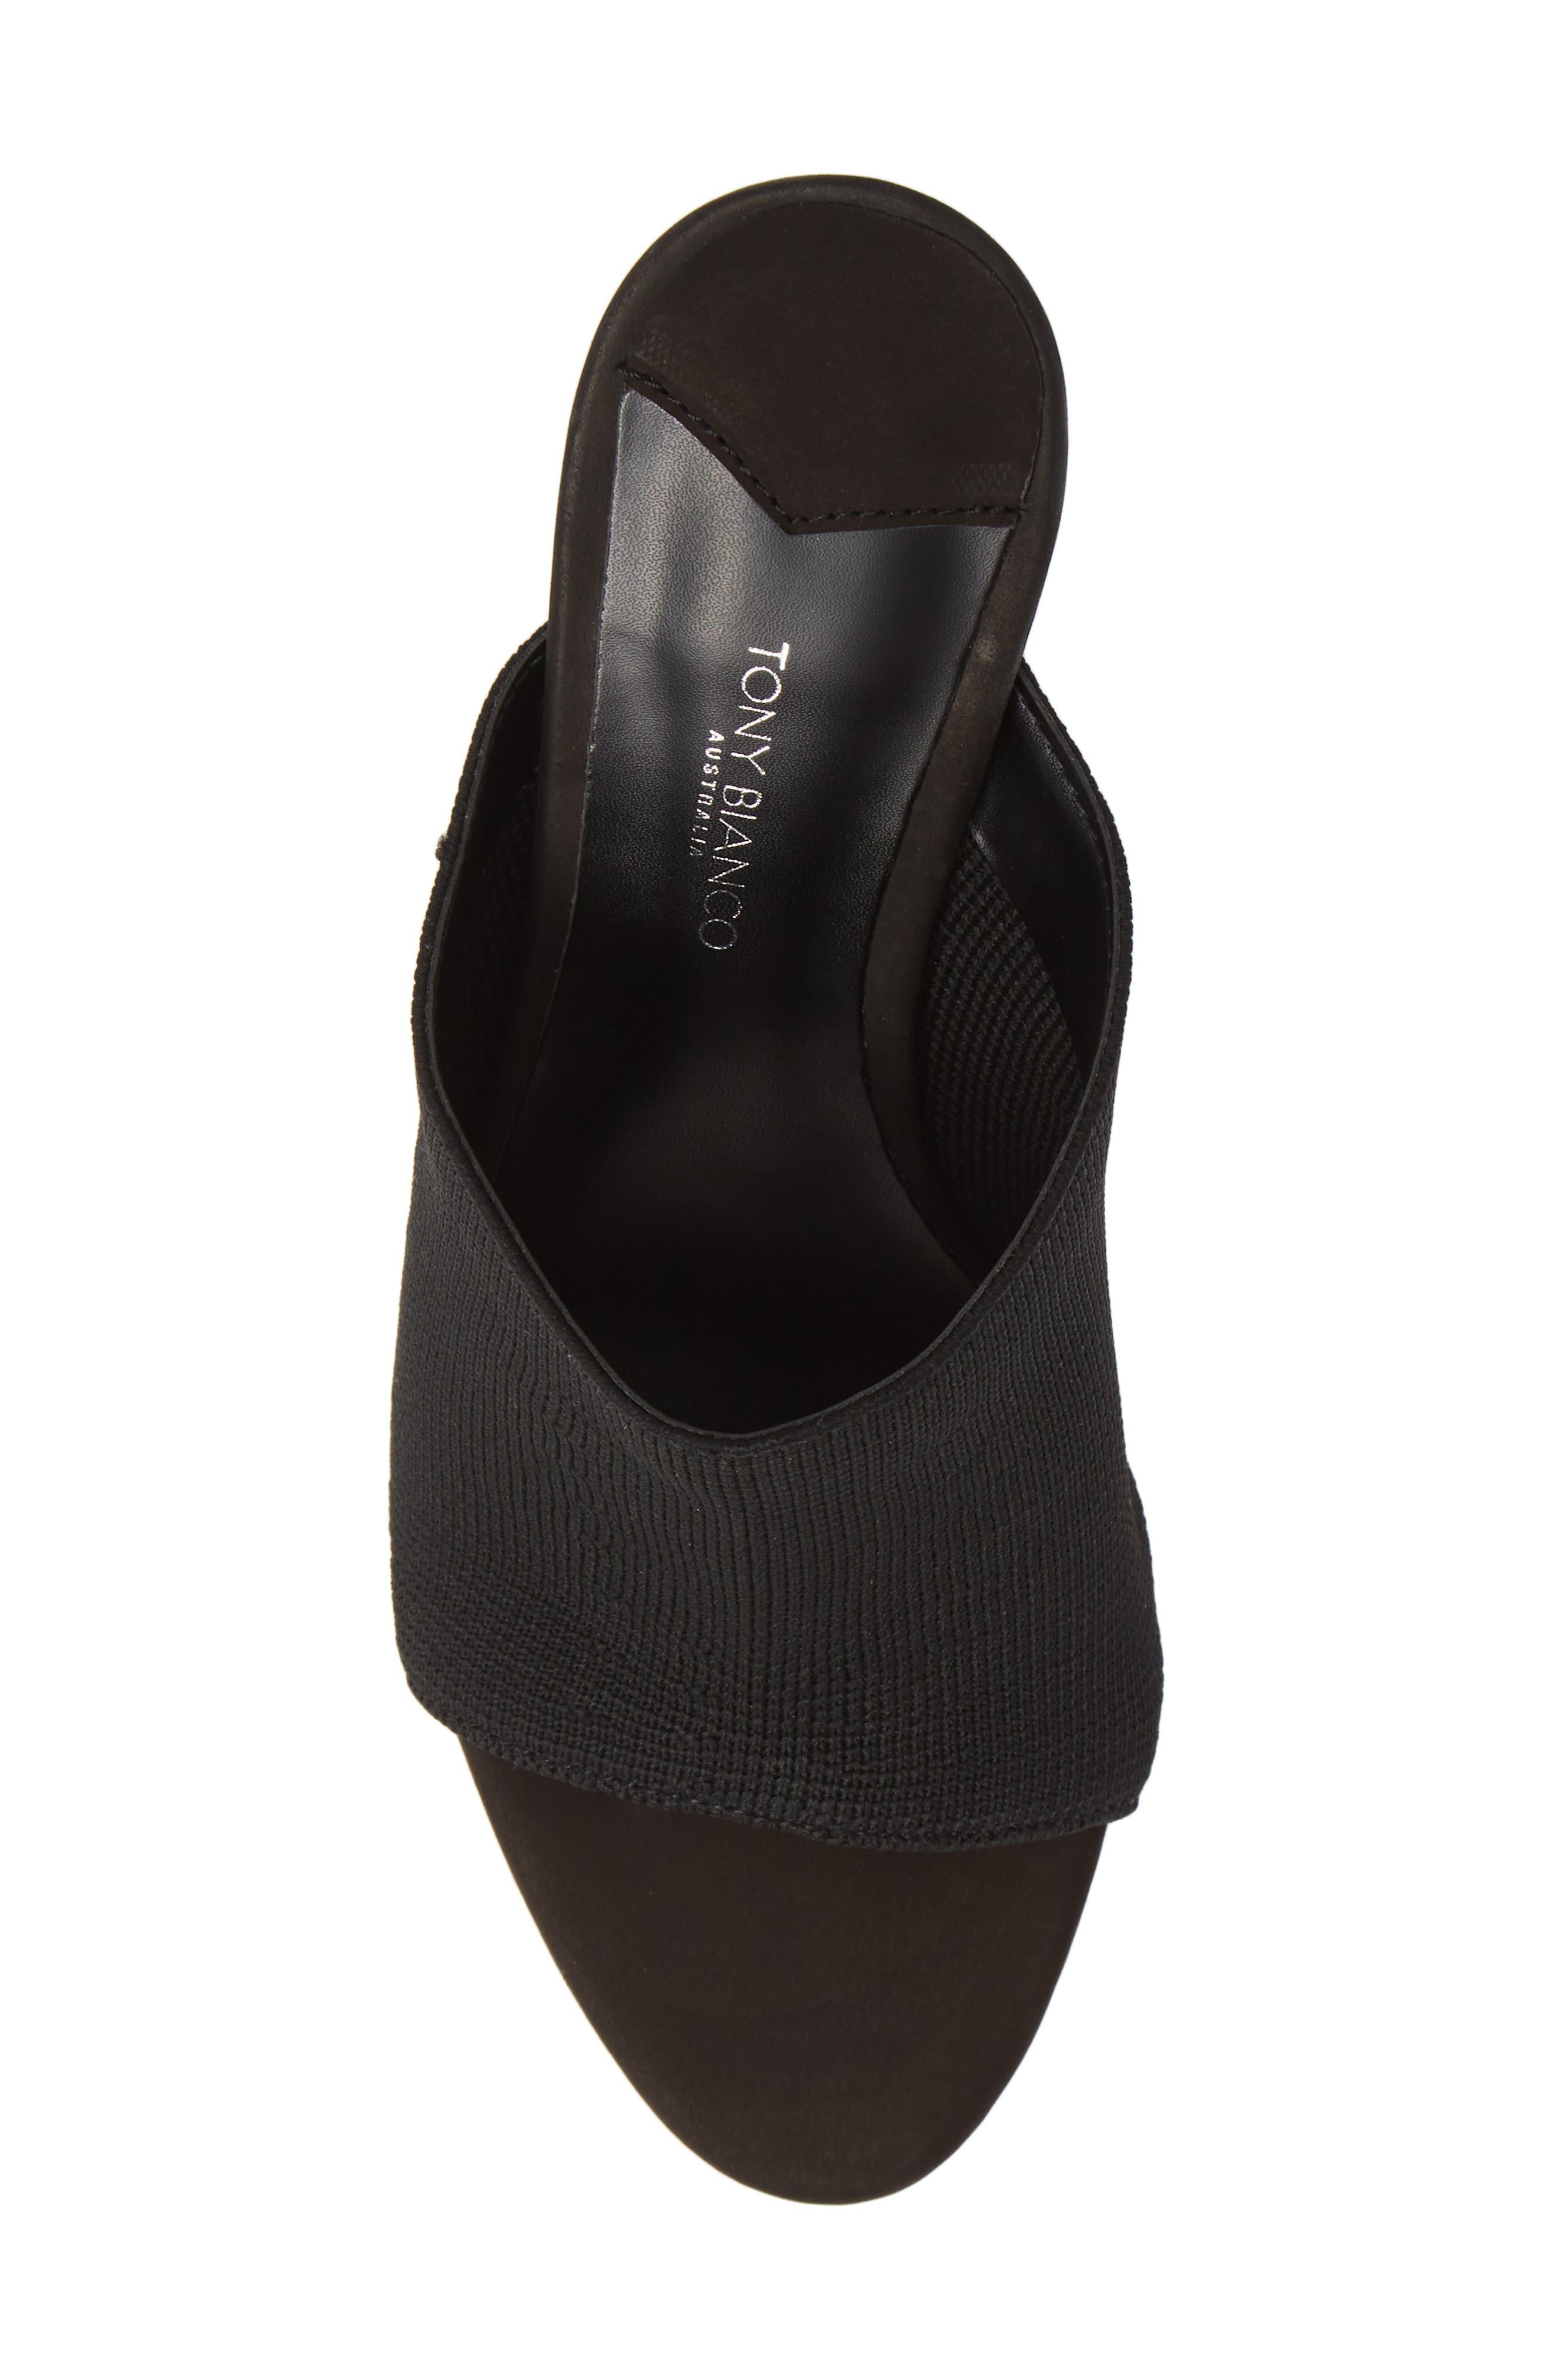 Inca Slide Sandal,                             Alternate thumbnail 5, color,                             BLACK BORDEAUX FABRIC